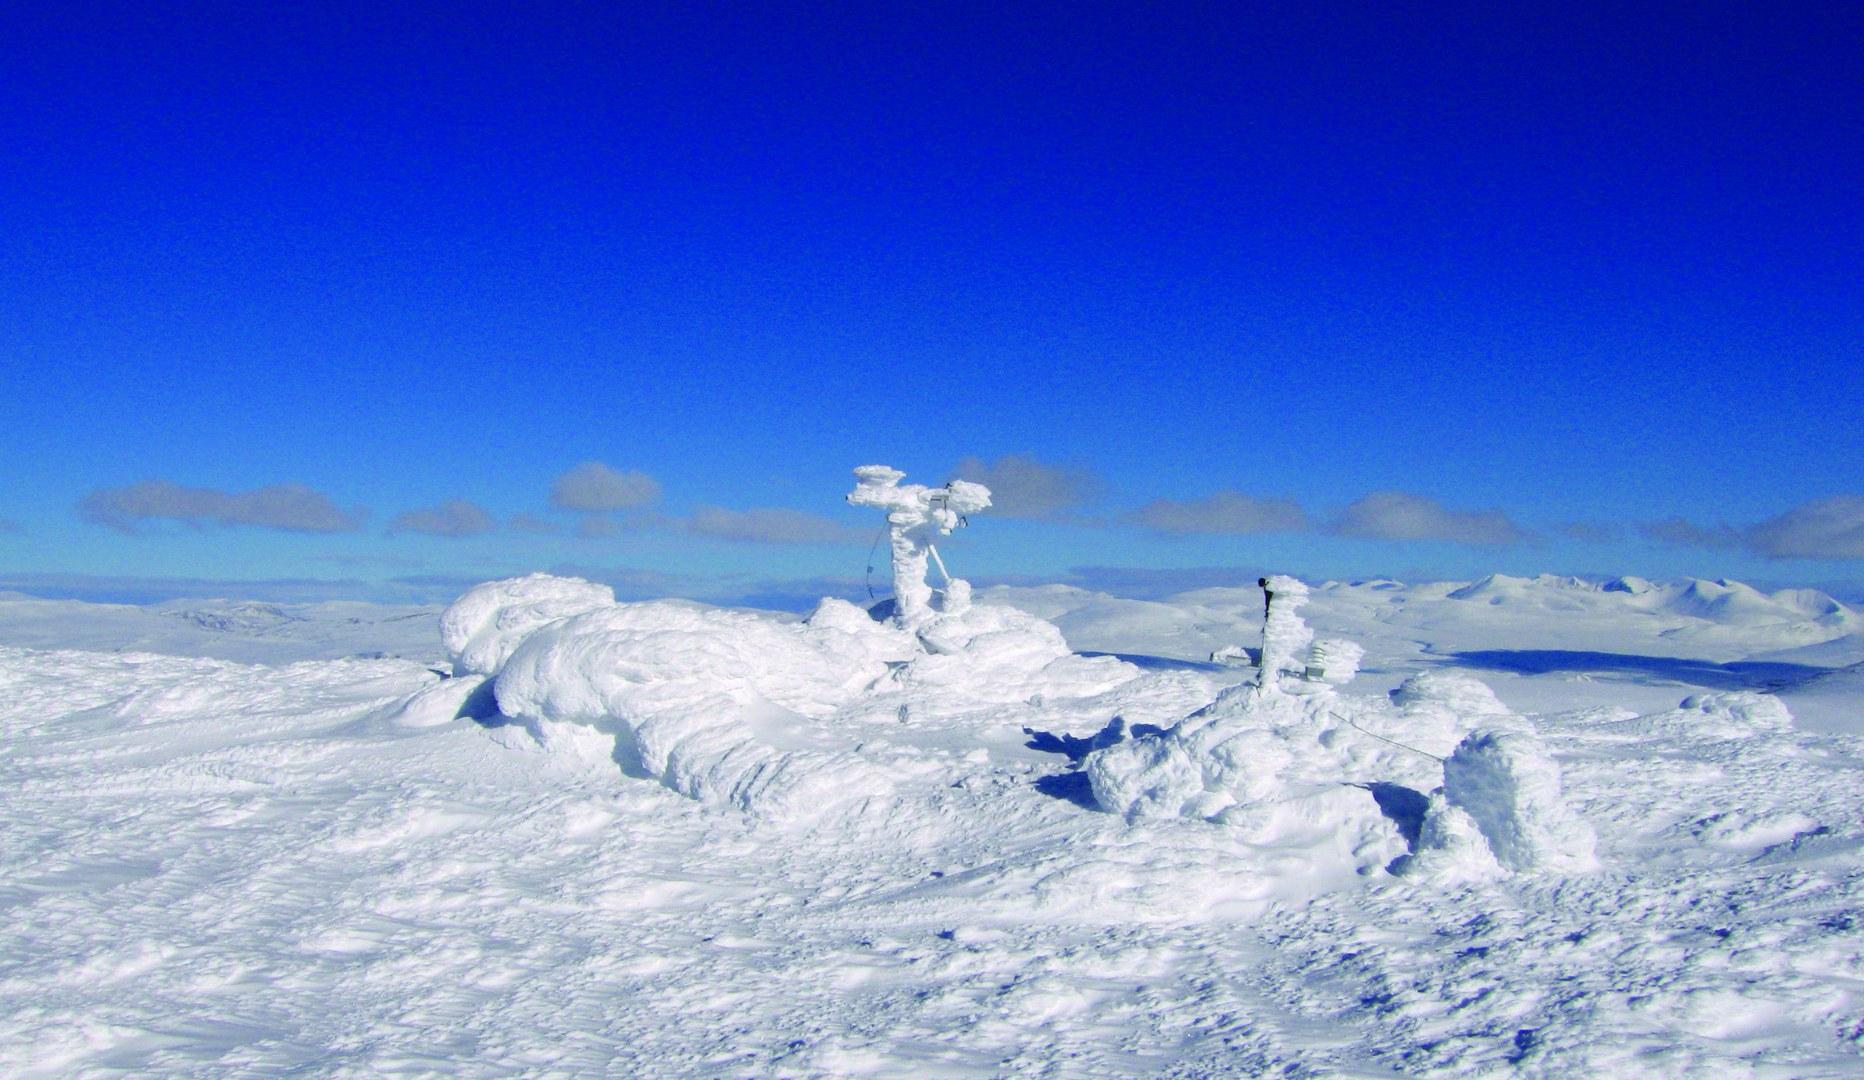 Klimastation im Eis